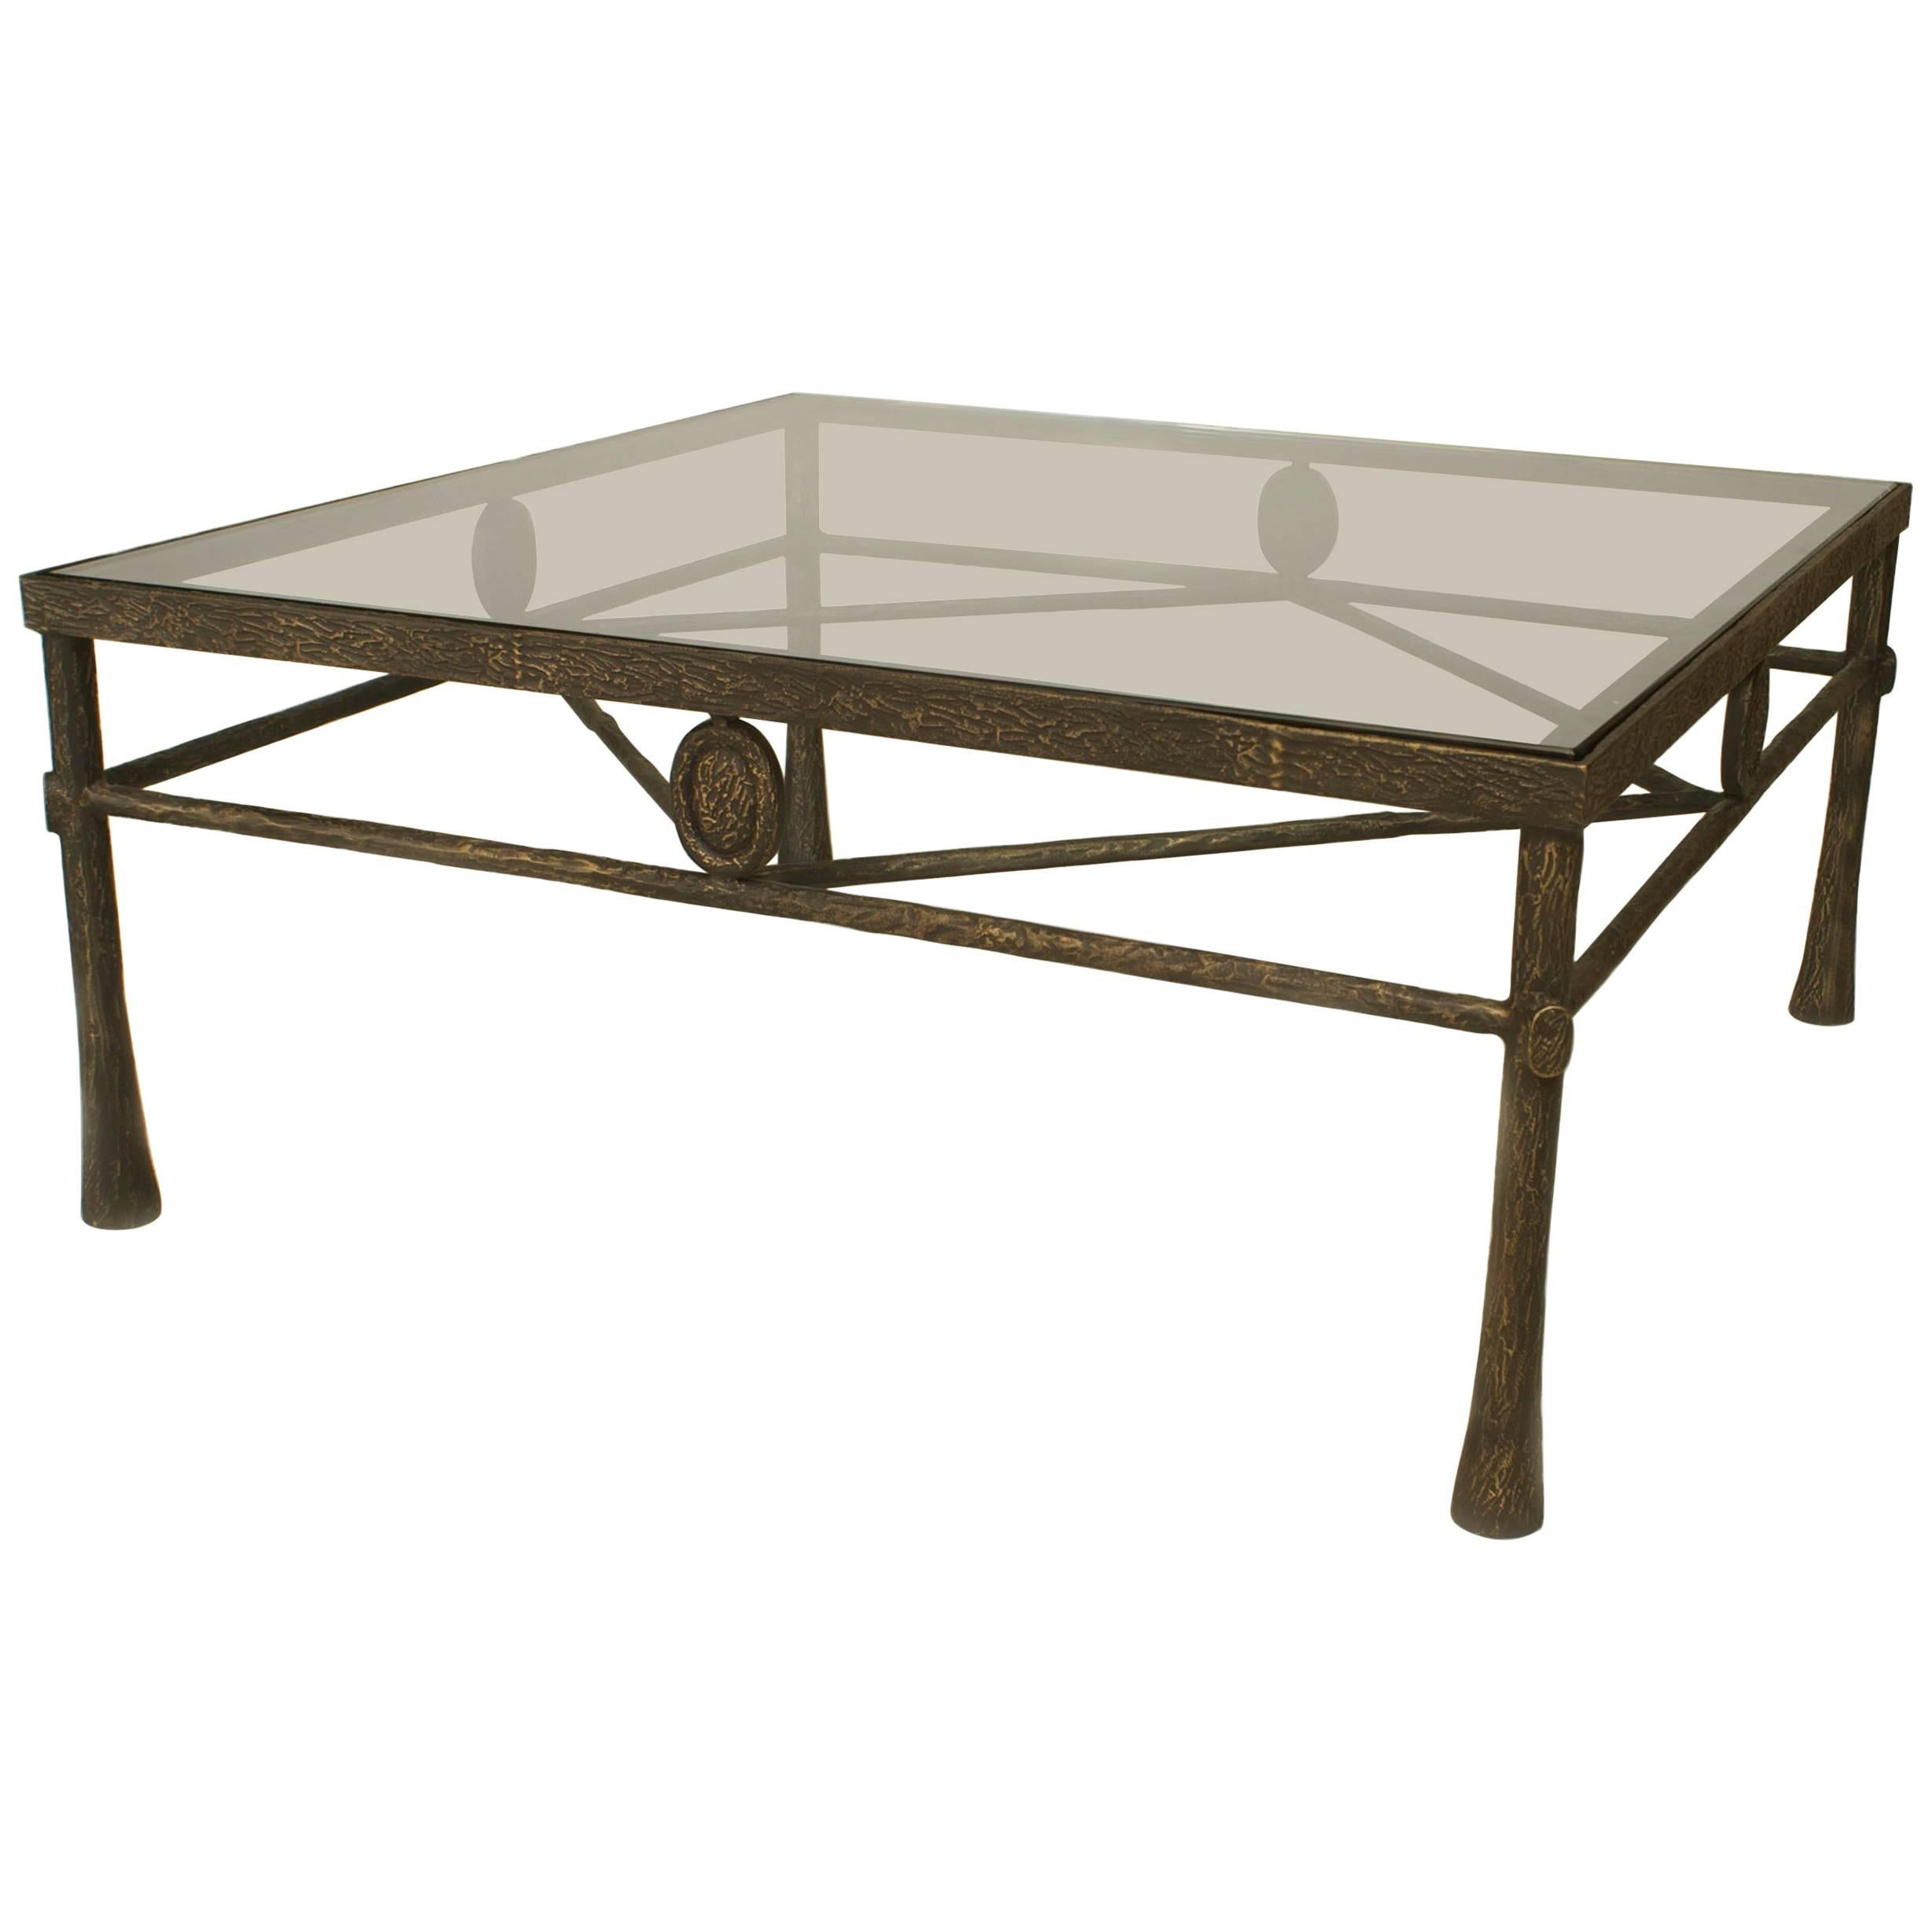 Postwar Design 'Giacometti Style' Dark Bronze Patina Coffee Table